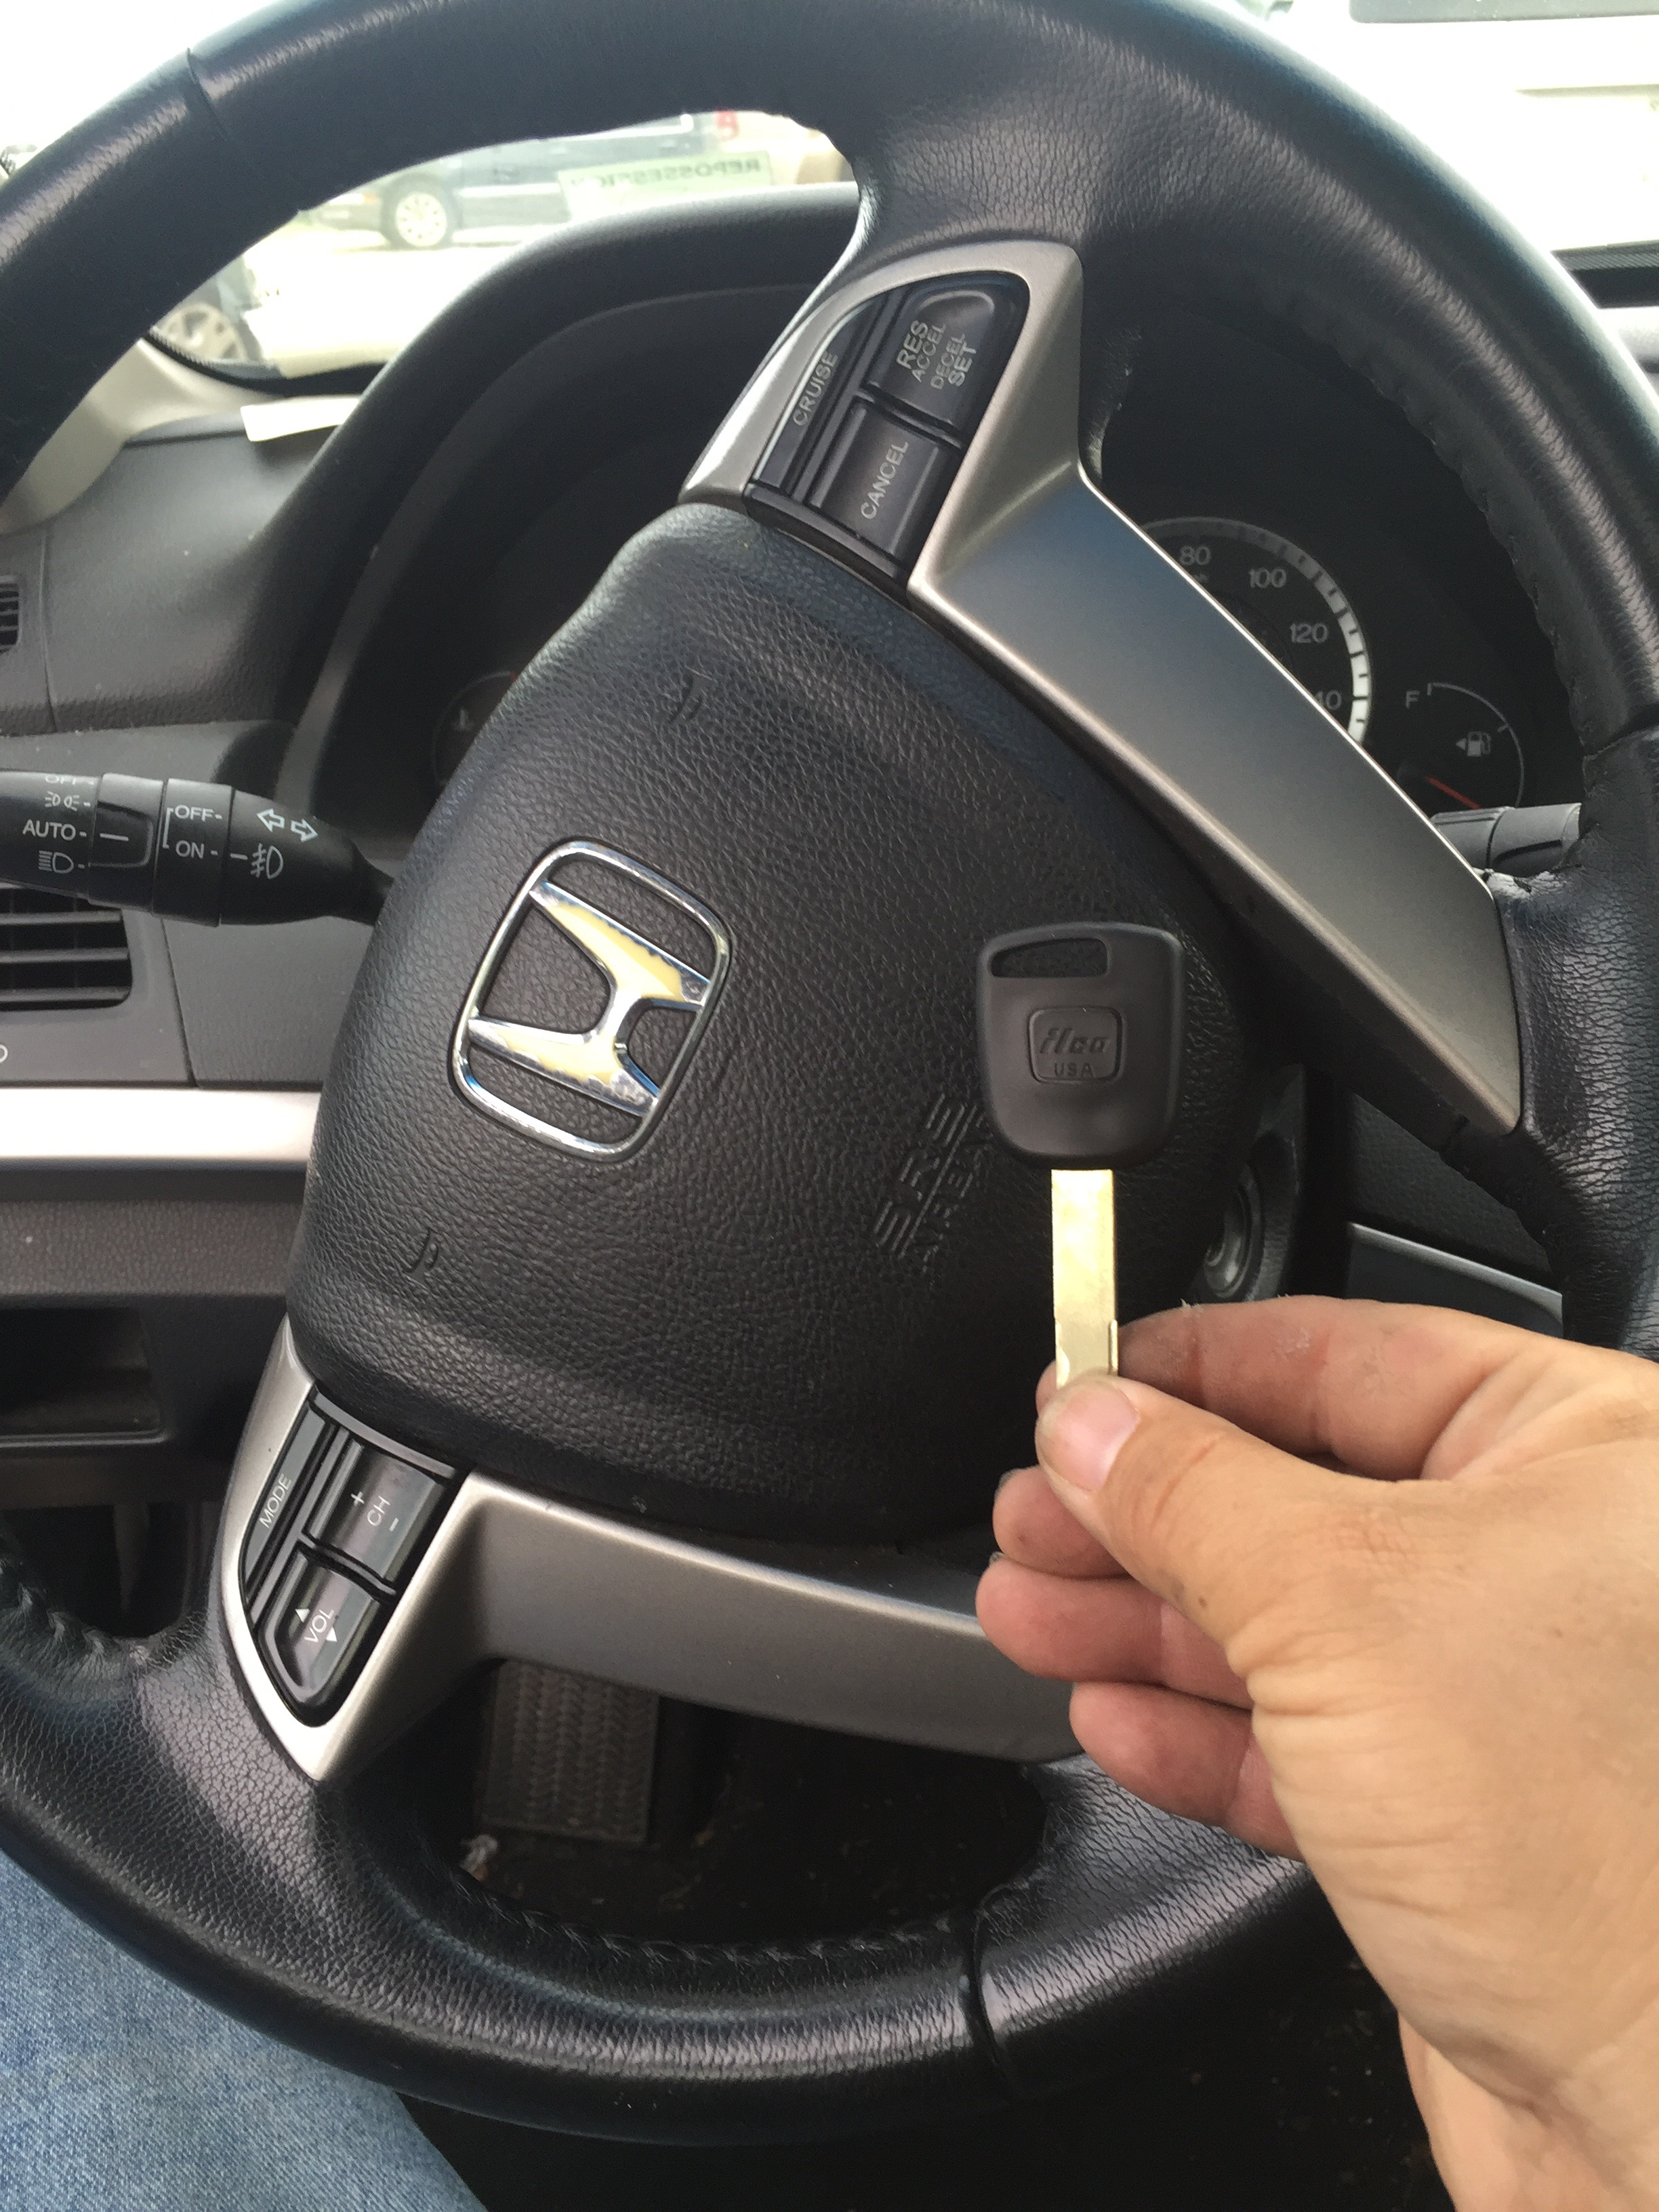 Lost Honda Accord Key